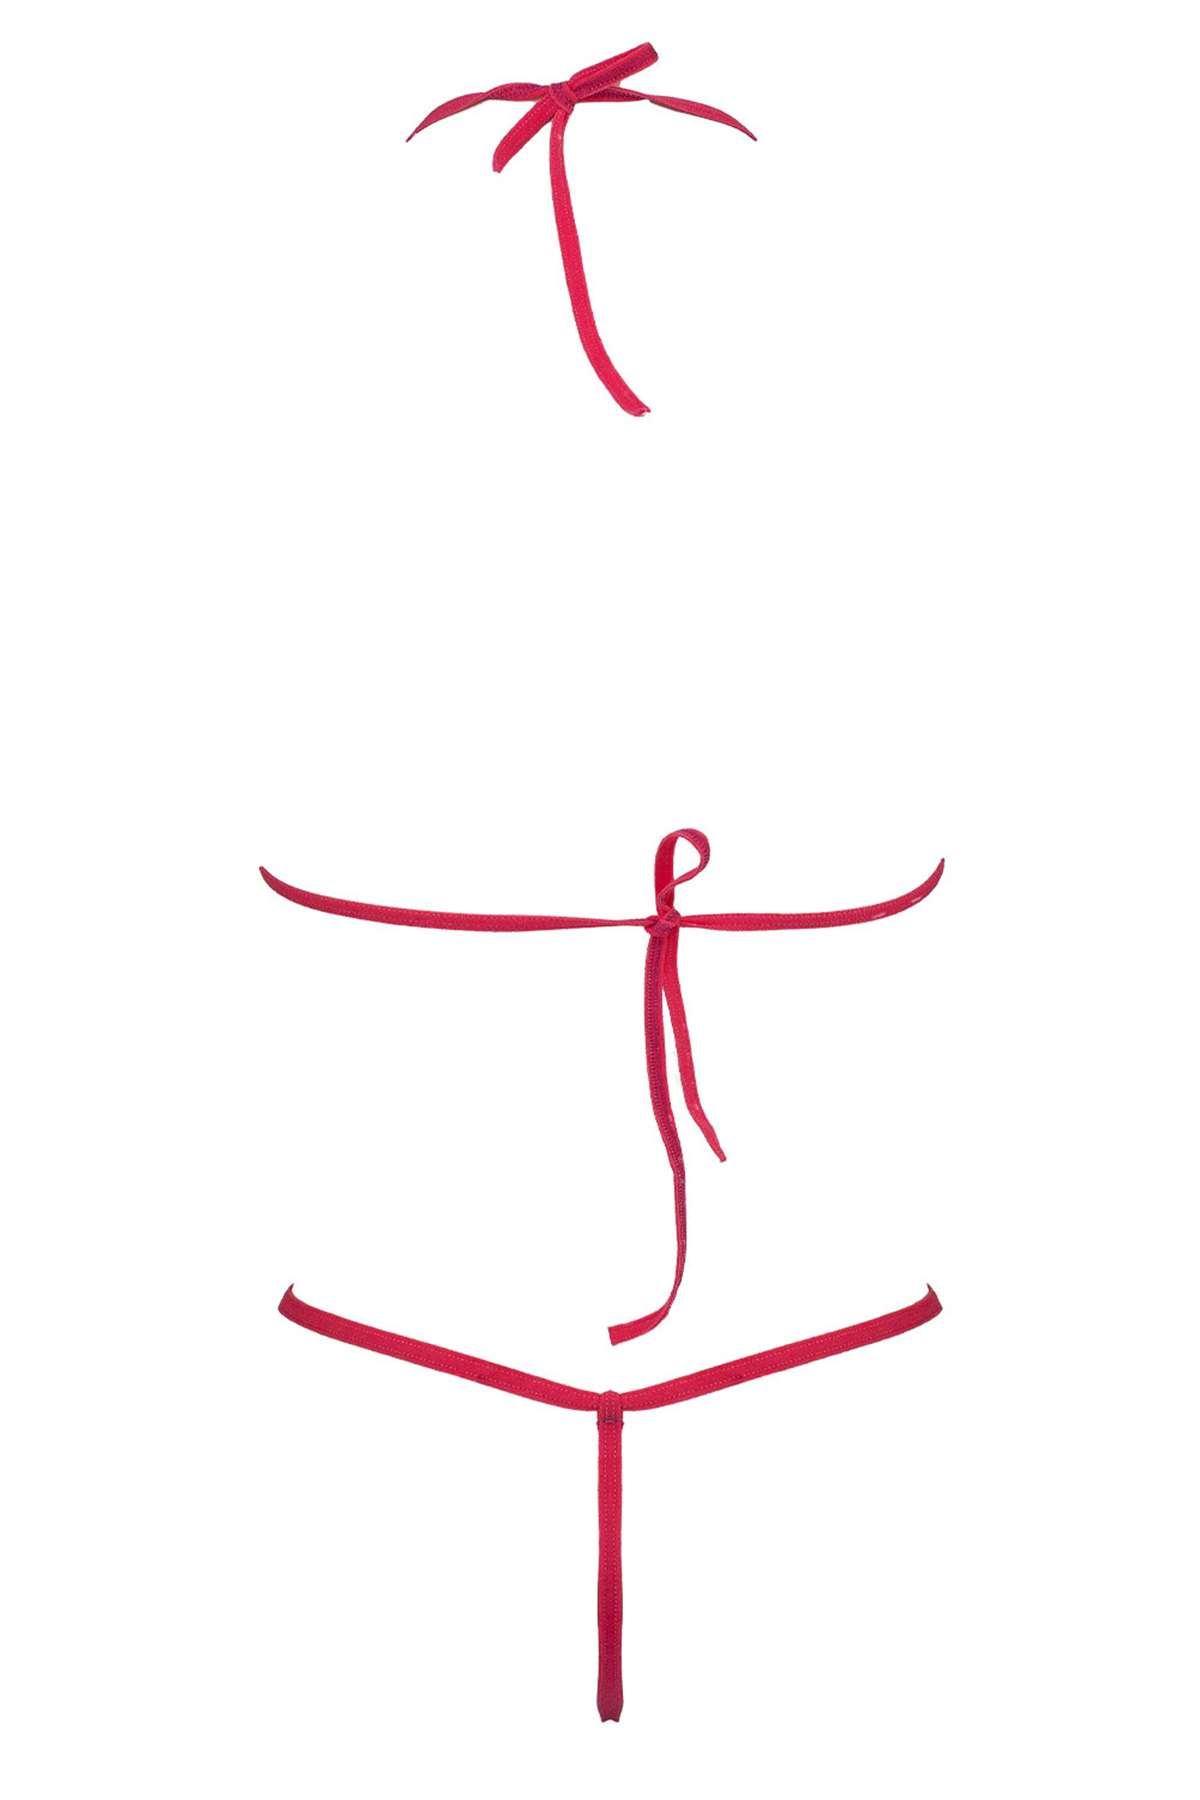 Dantel Sütyen Tanga Takım Fuşya - 1160.1364. Toptan